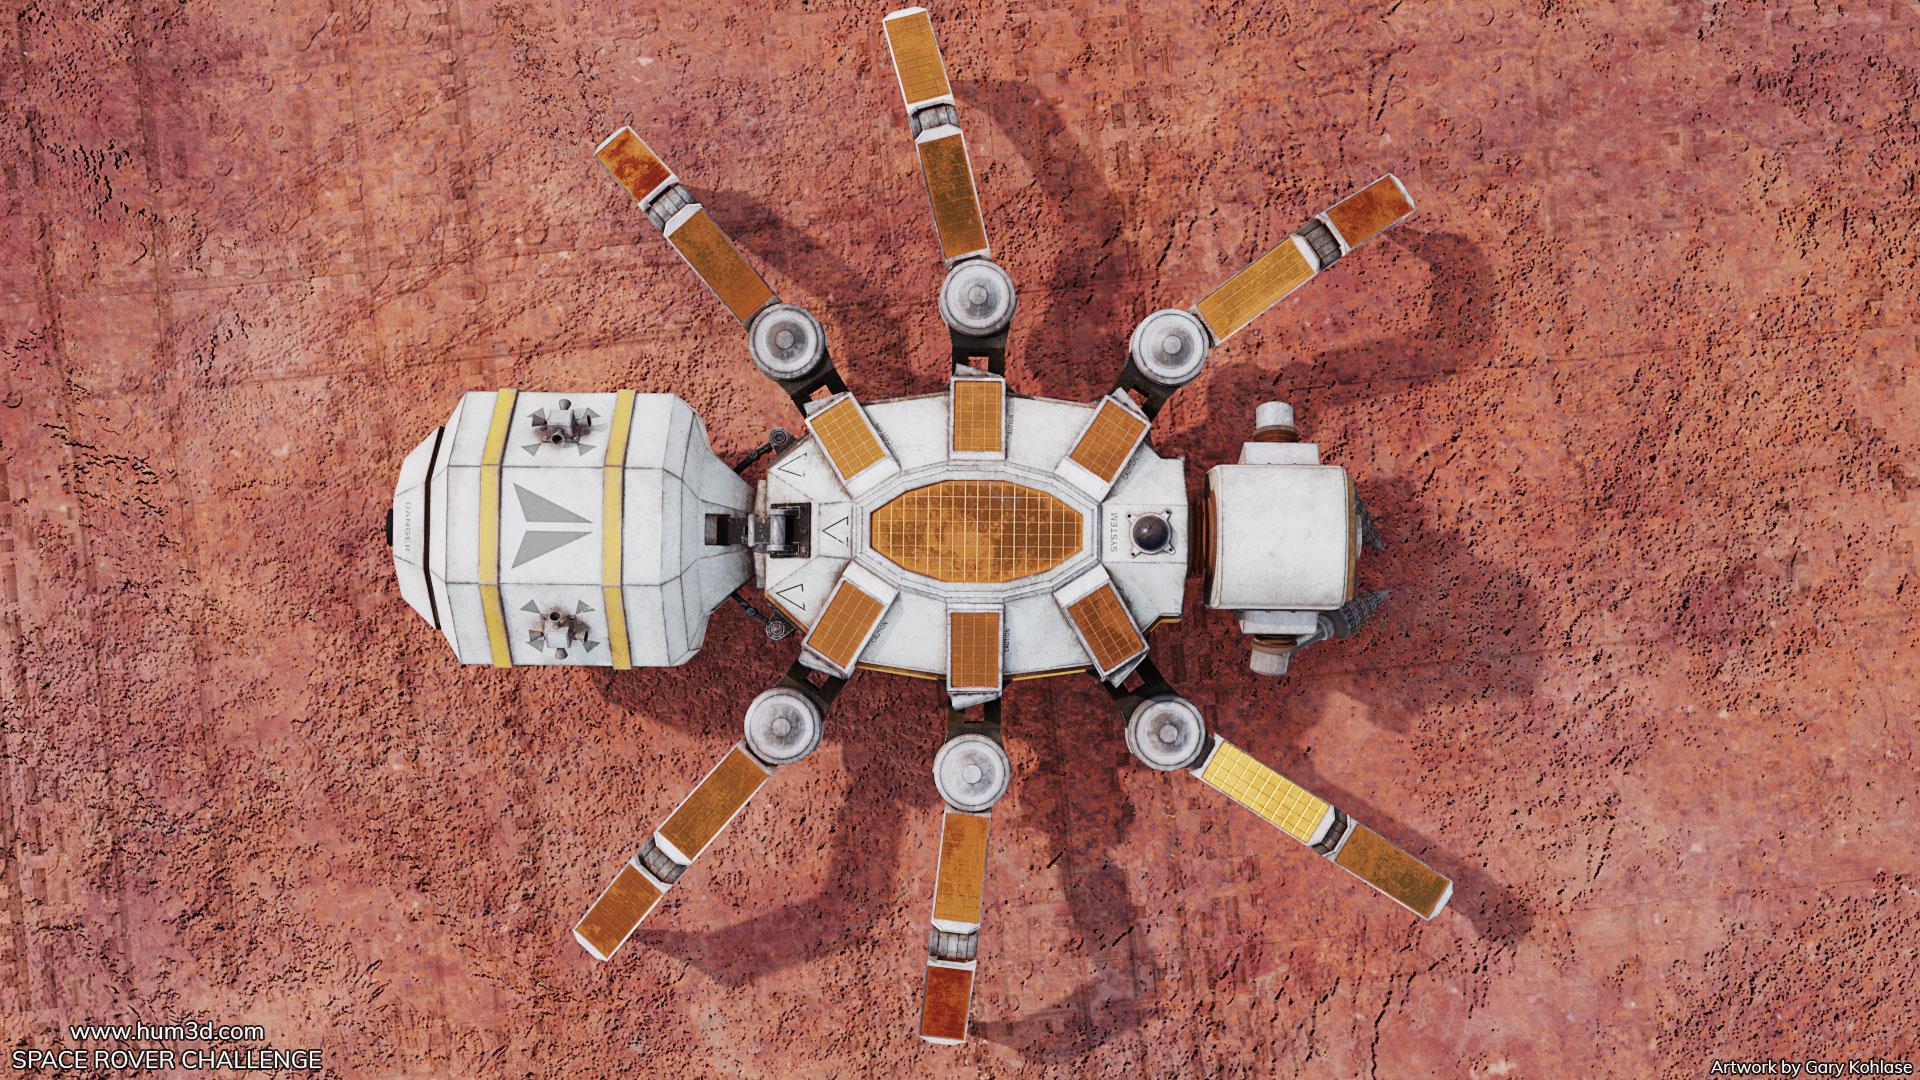 [Space Rover Challenge] Harvest Spider Drone